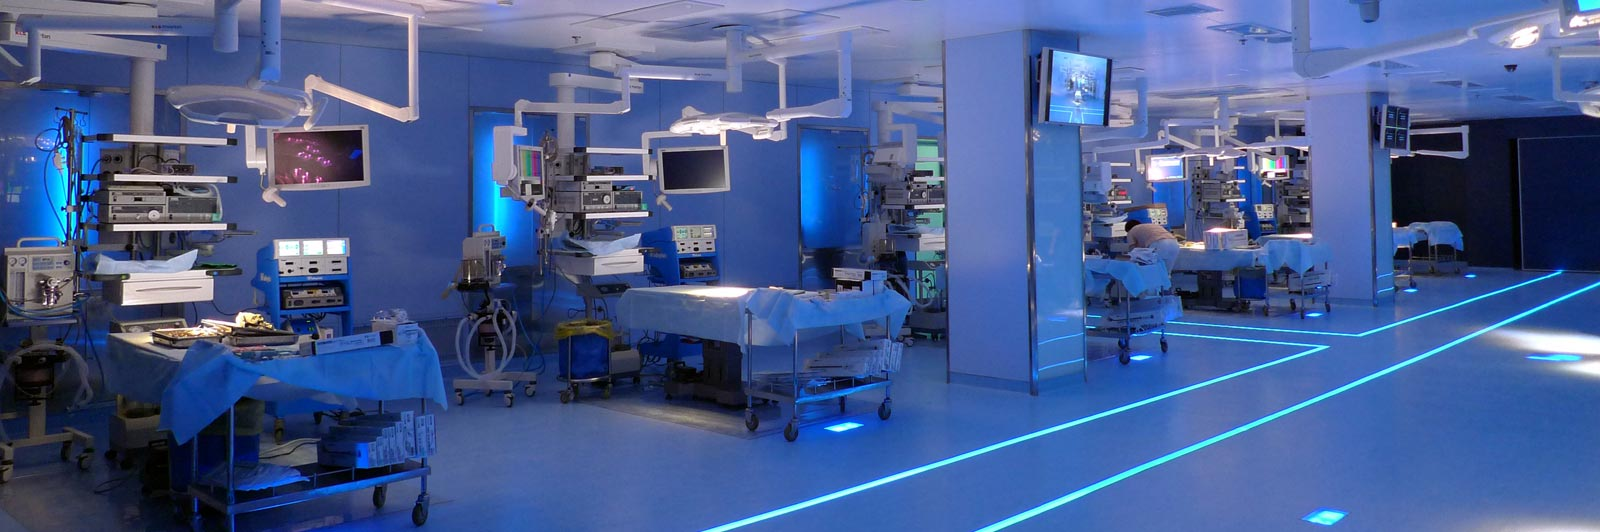 Medical Equipment Leasing & Financing